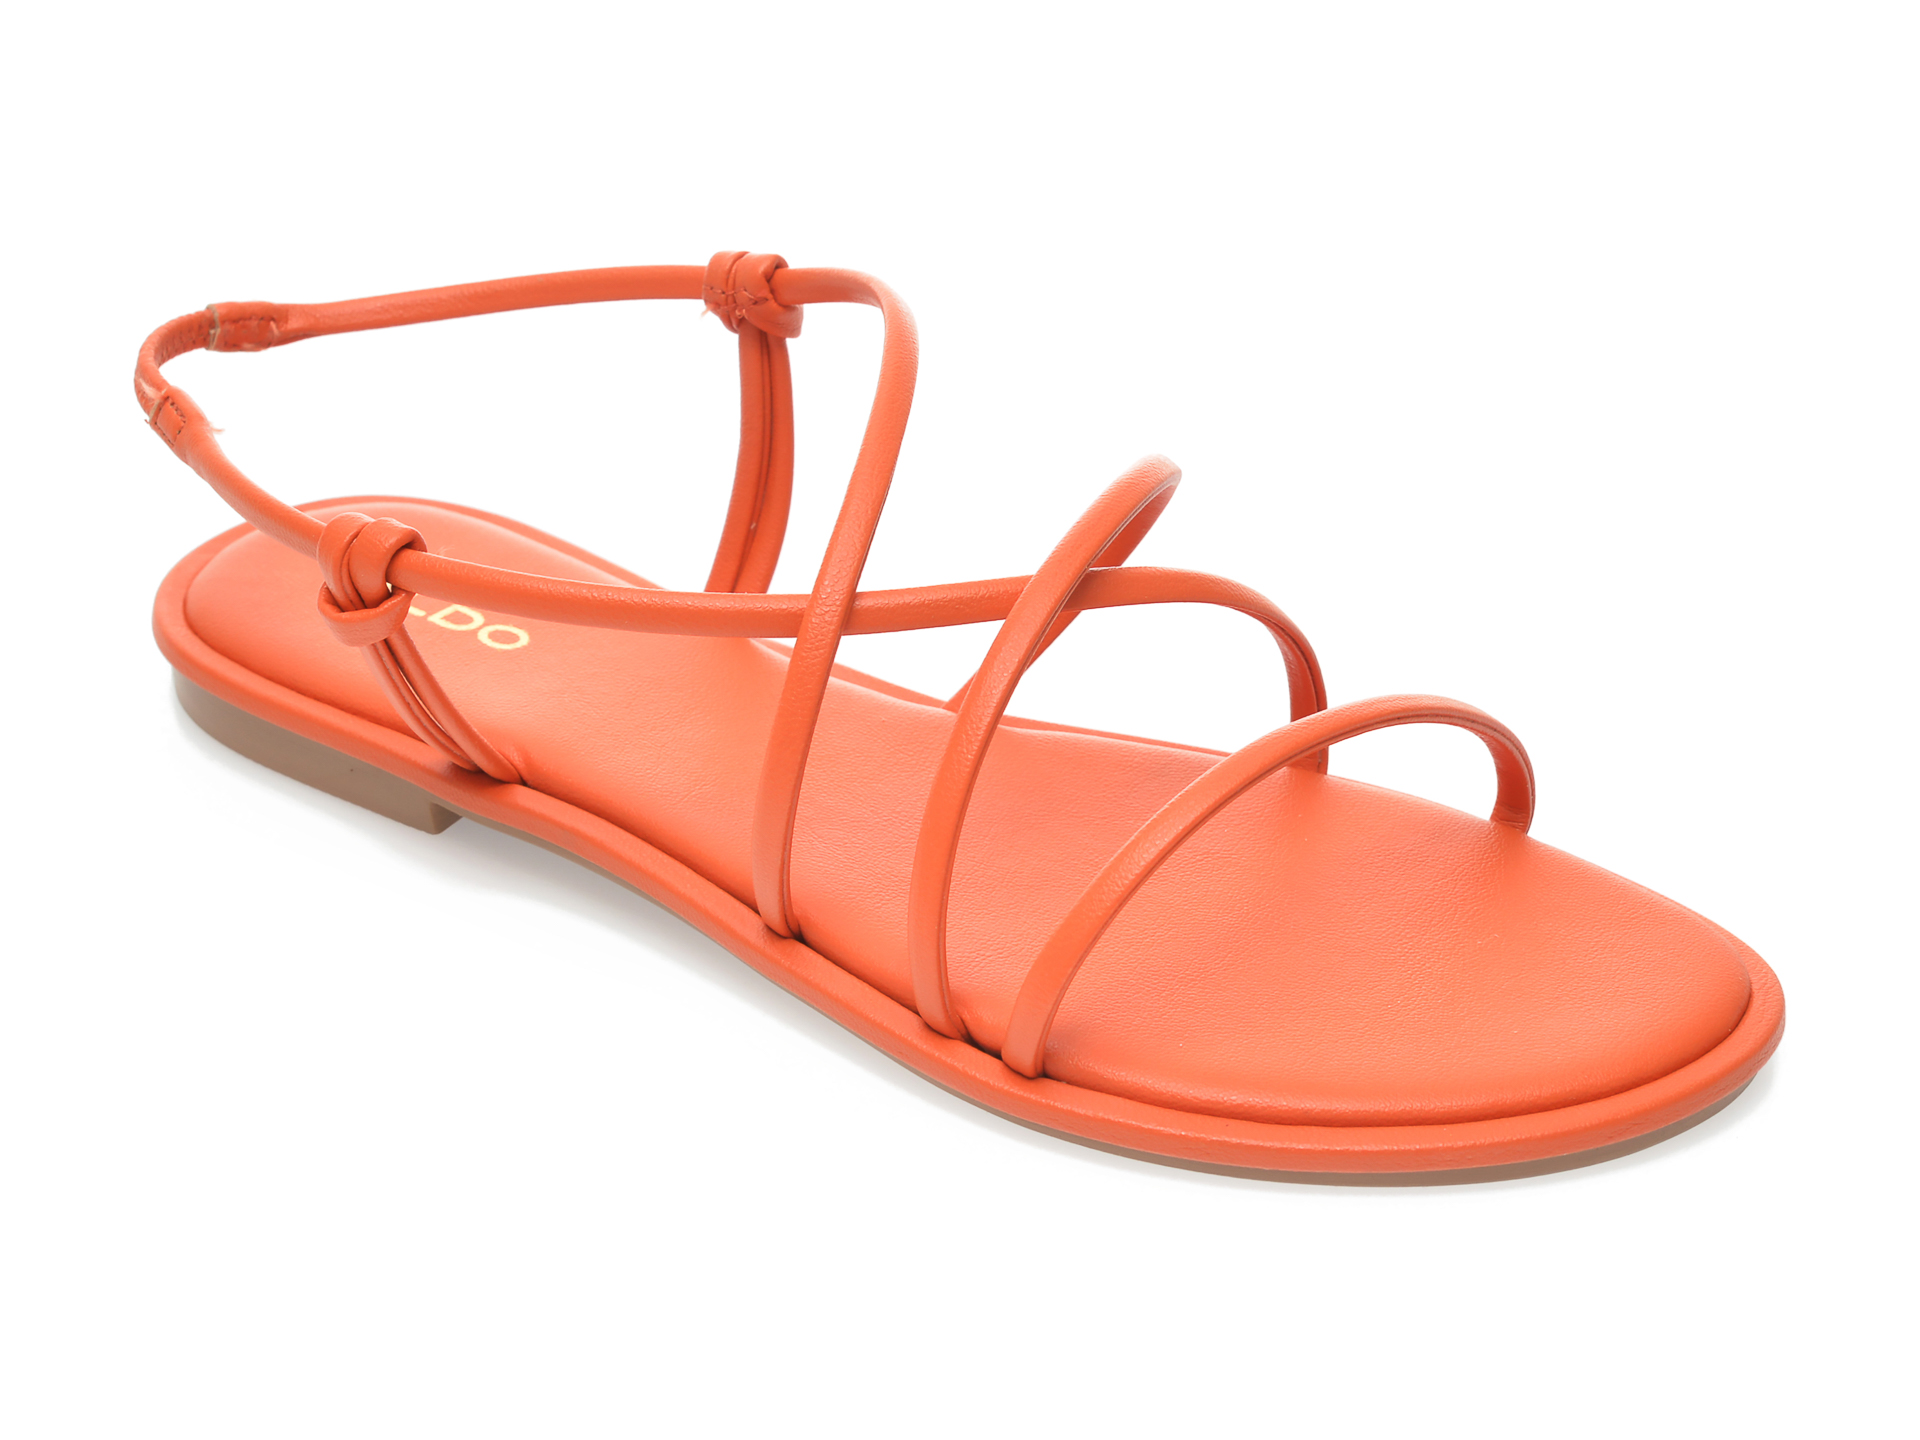 Sandale ALDO portocalii, Kuerten800, din piele ecologica imagine otter.ro